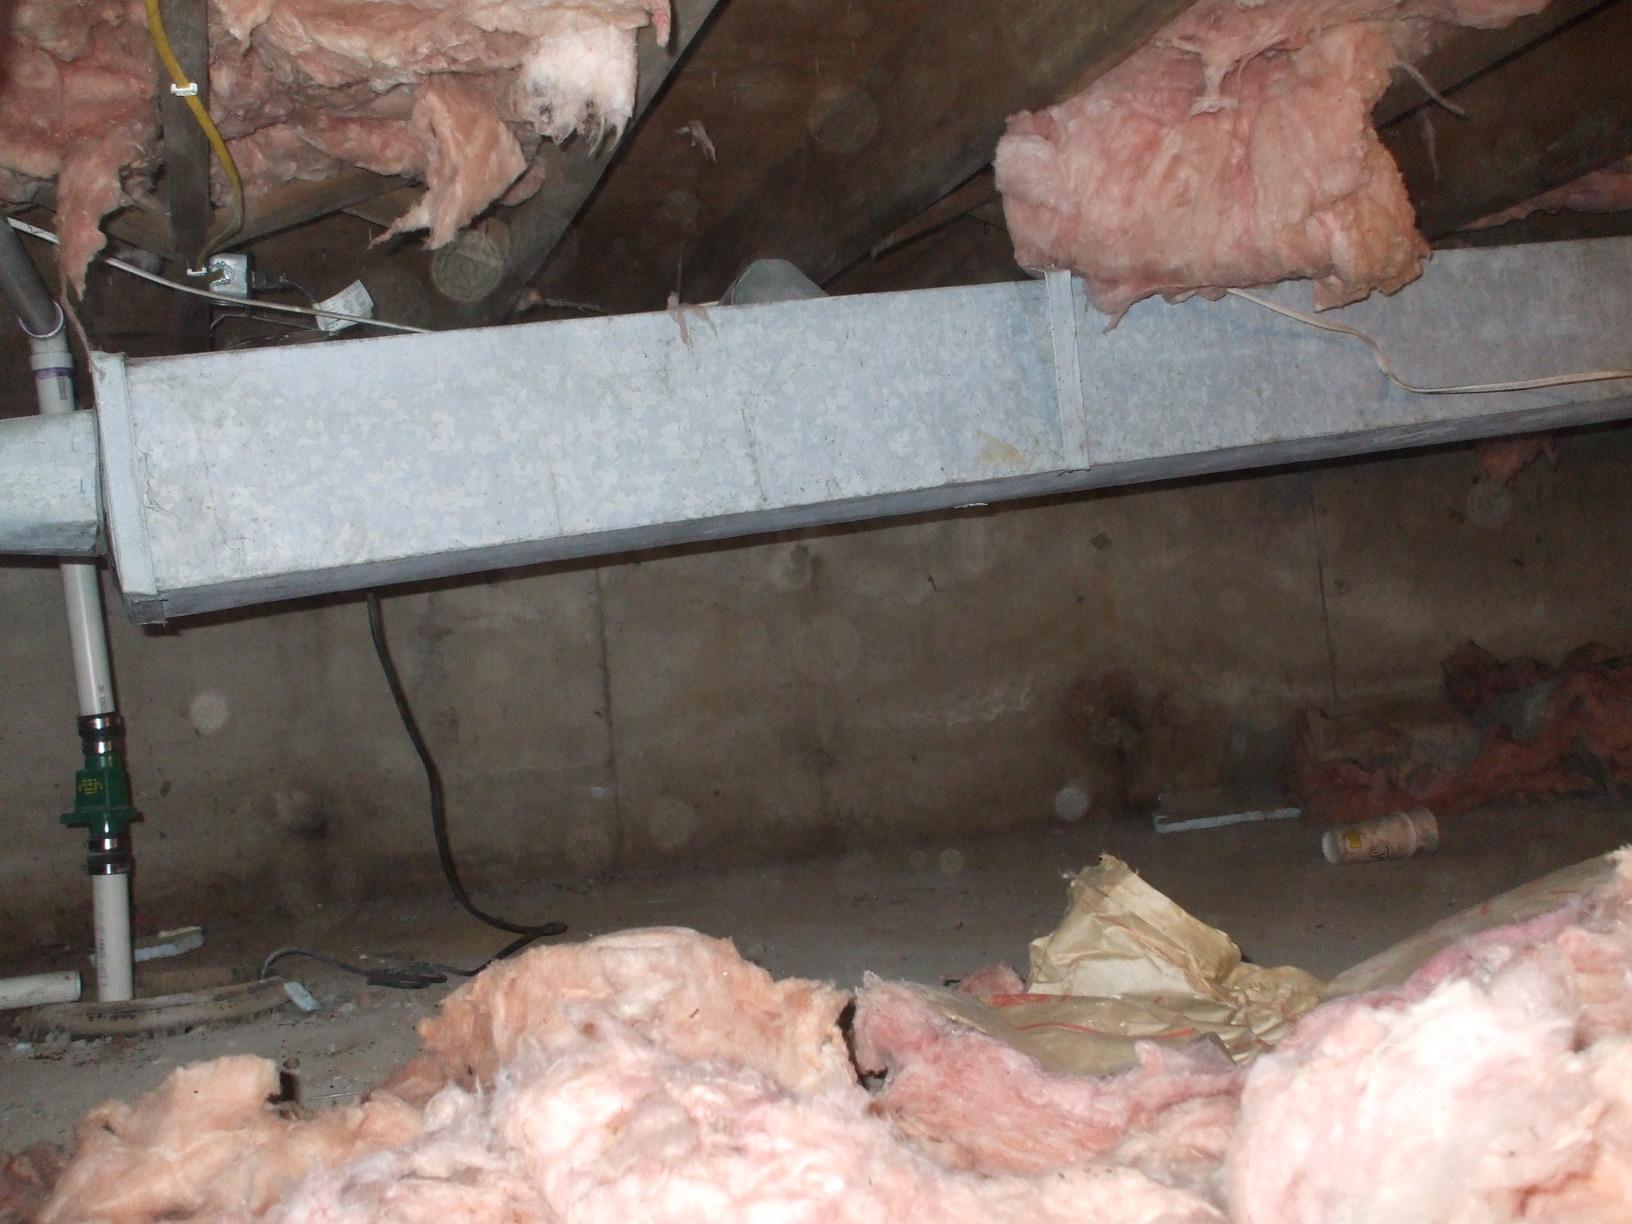 Nyack Crawlspace transformation and dehumidifier instillation - Before Photo